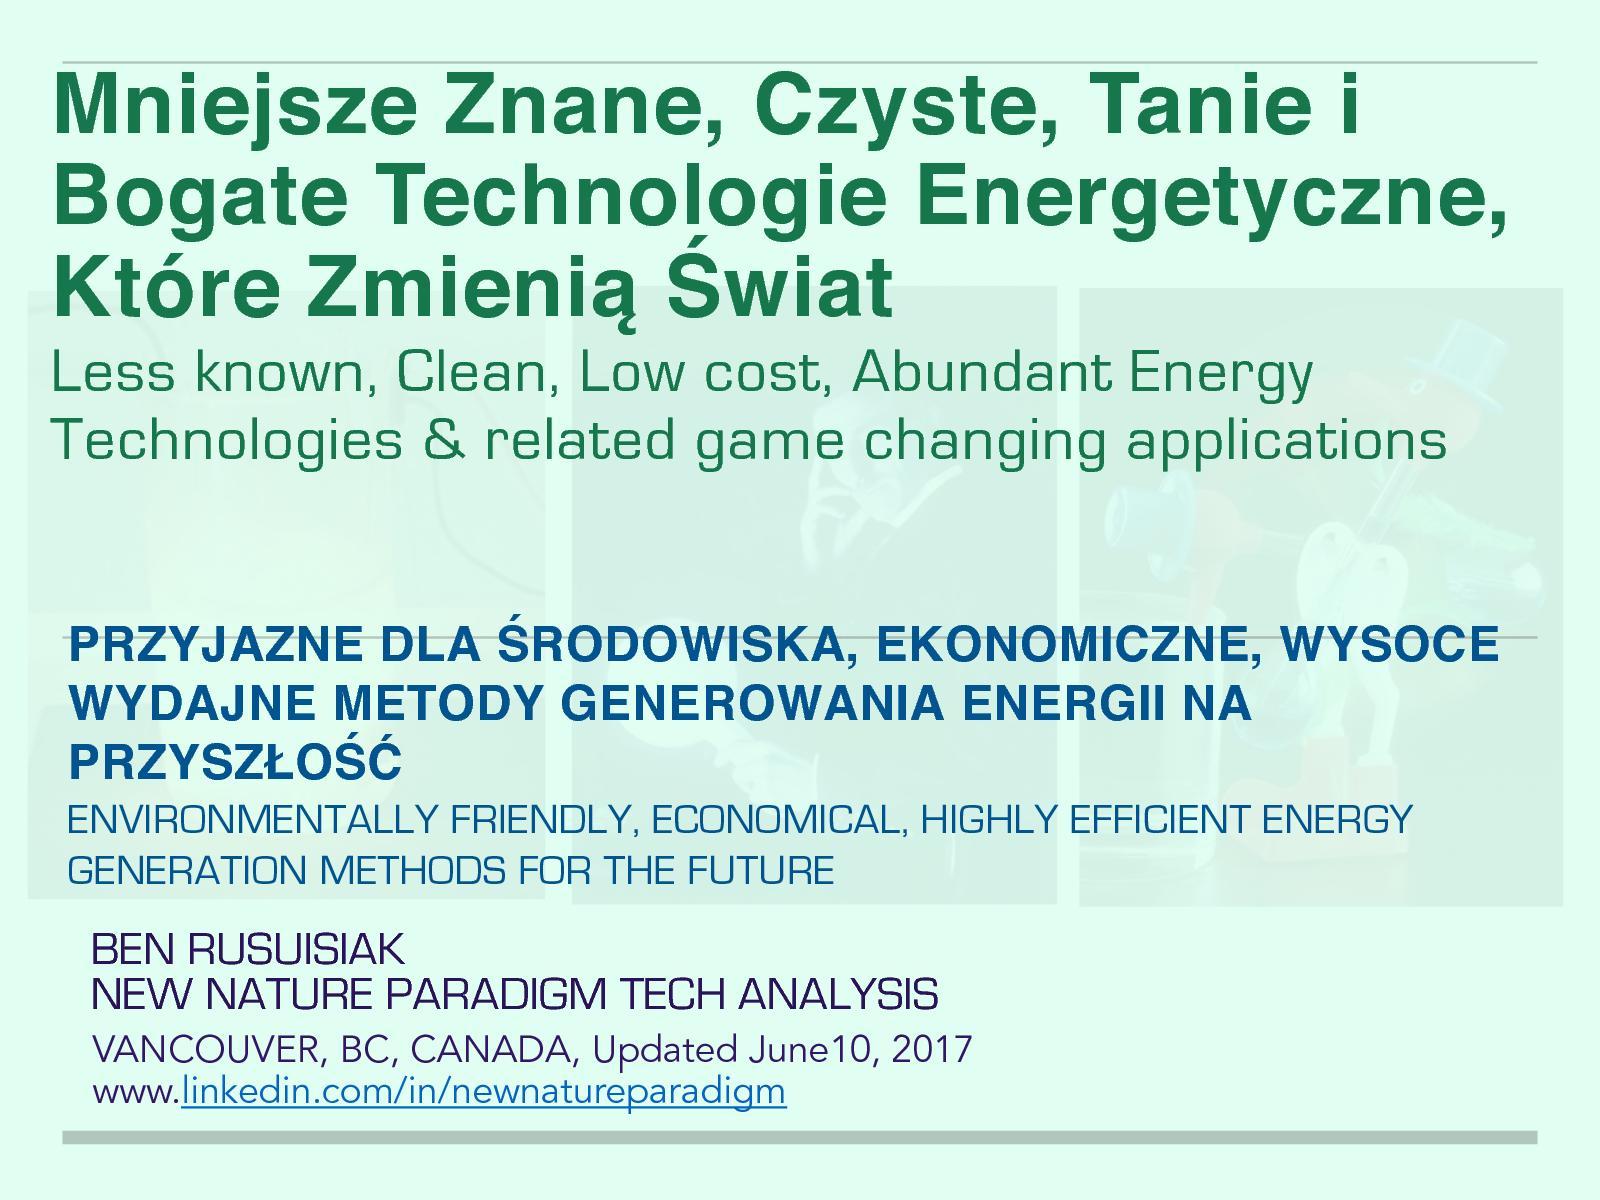 Calamo Mniejsze Znane Czyste Tanie I Bogate Technologie Making A Parallel Path Overunity Device Circuit Electronic Energetyczne Ktre Zmieni Wiat Less Known Clean Affordable Abundant Energy Technologies